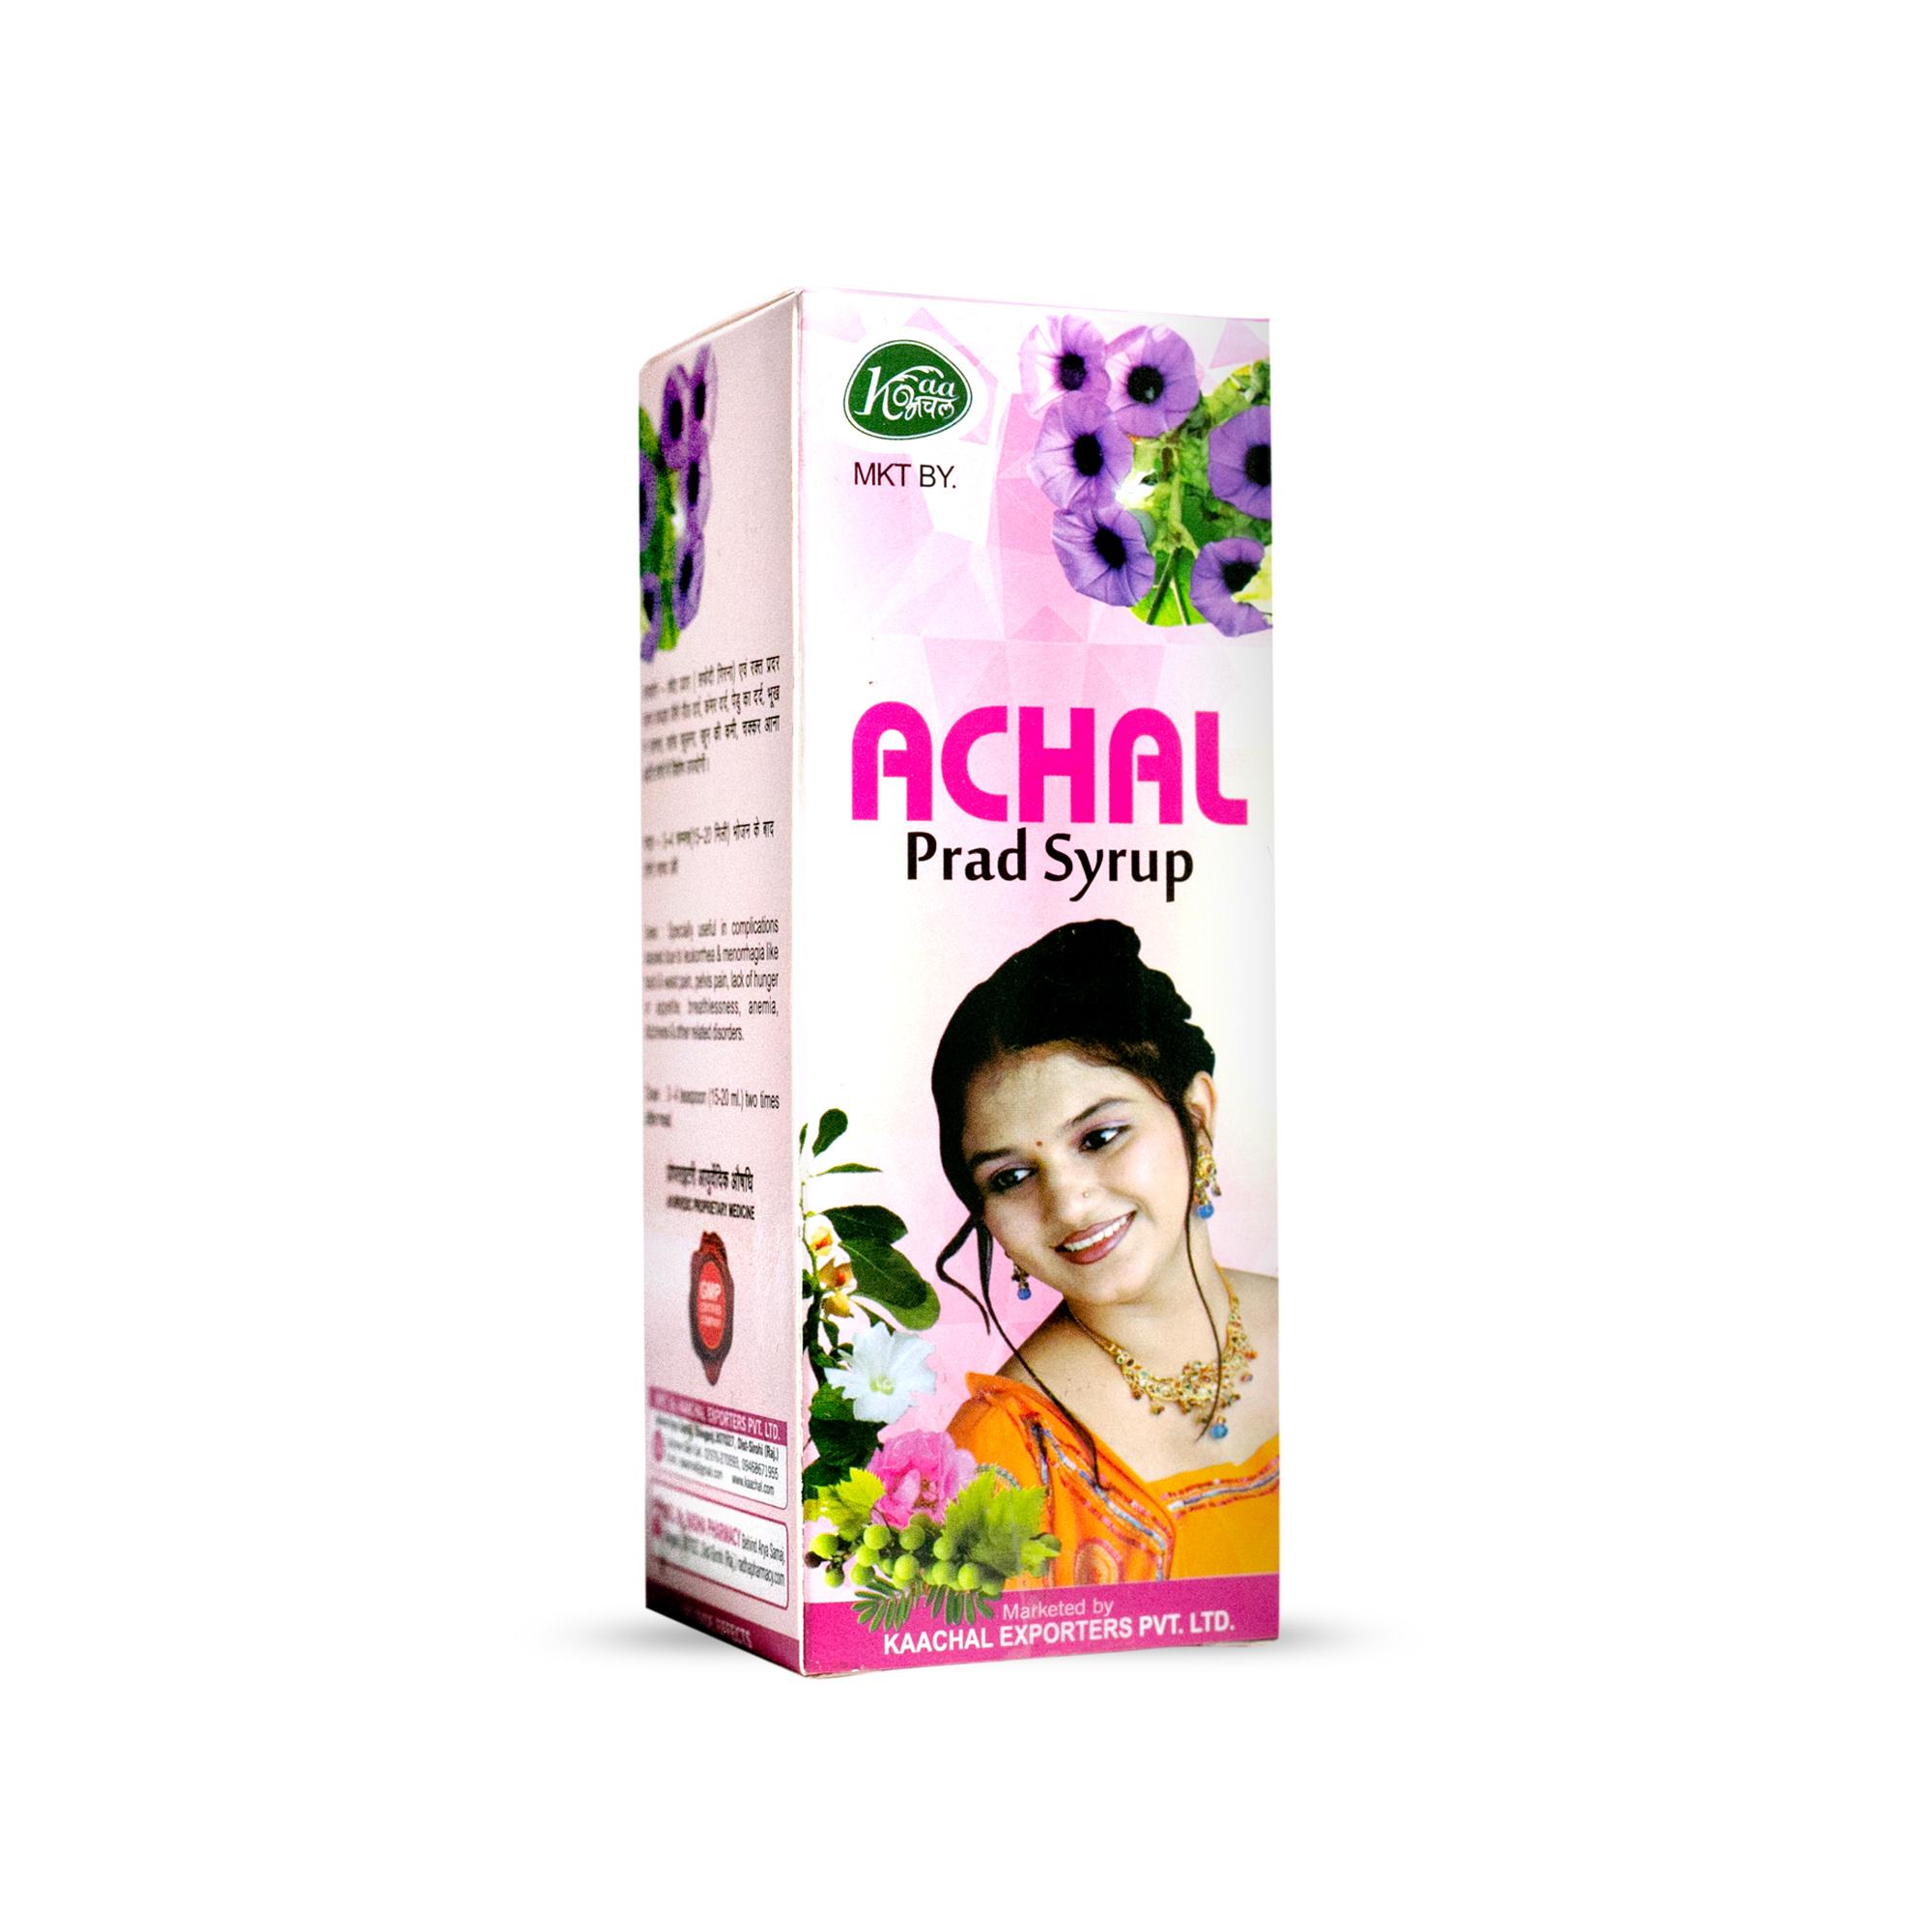 Achal Prad Syrup